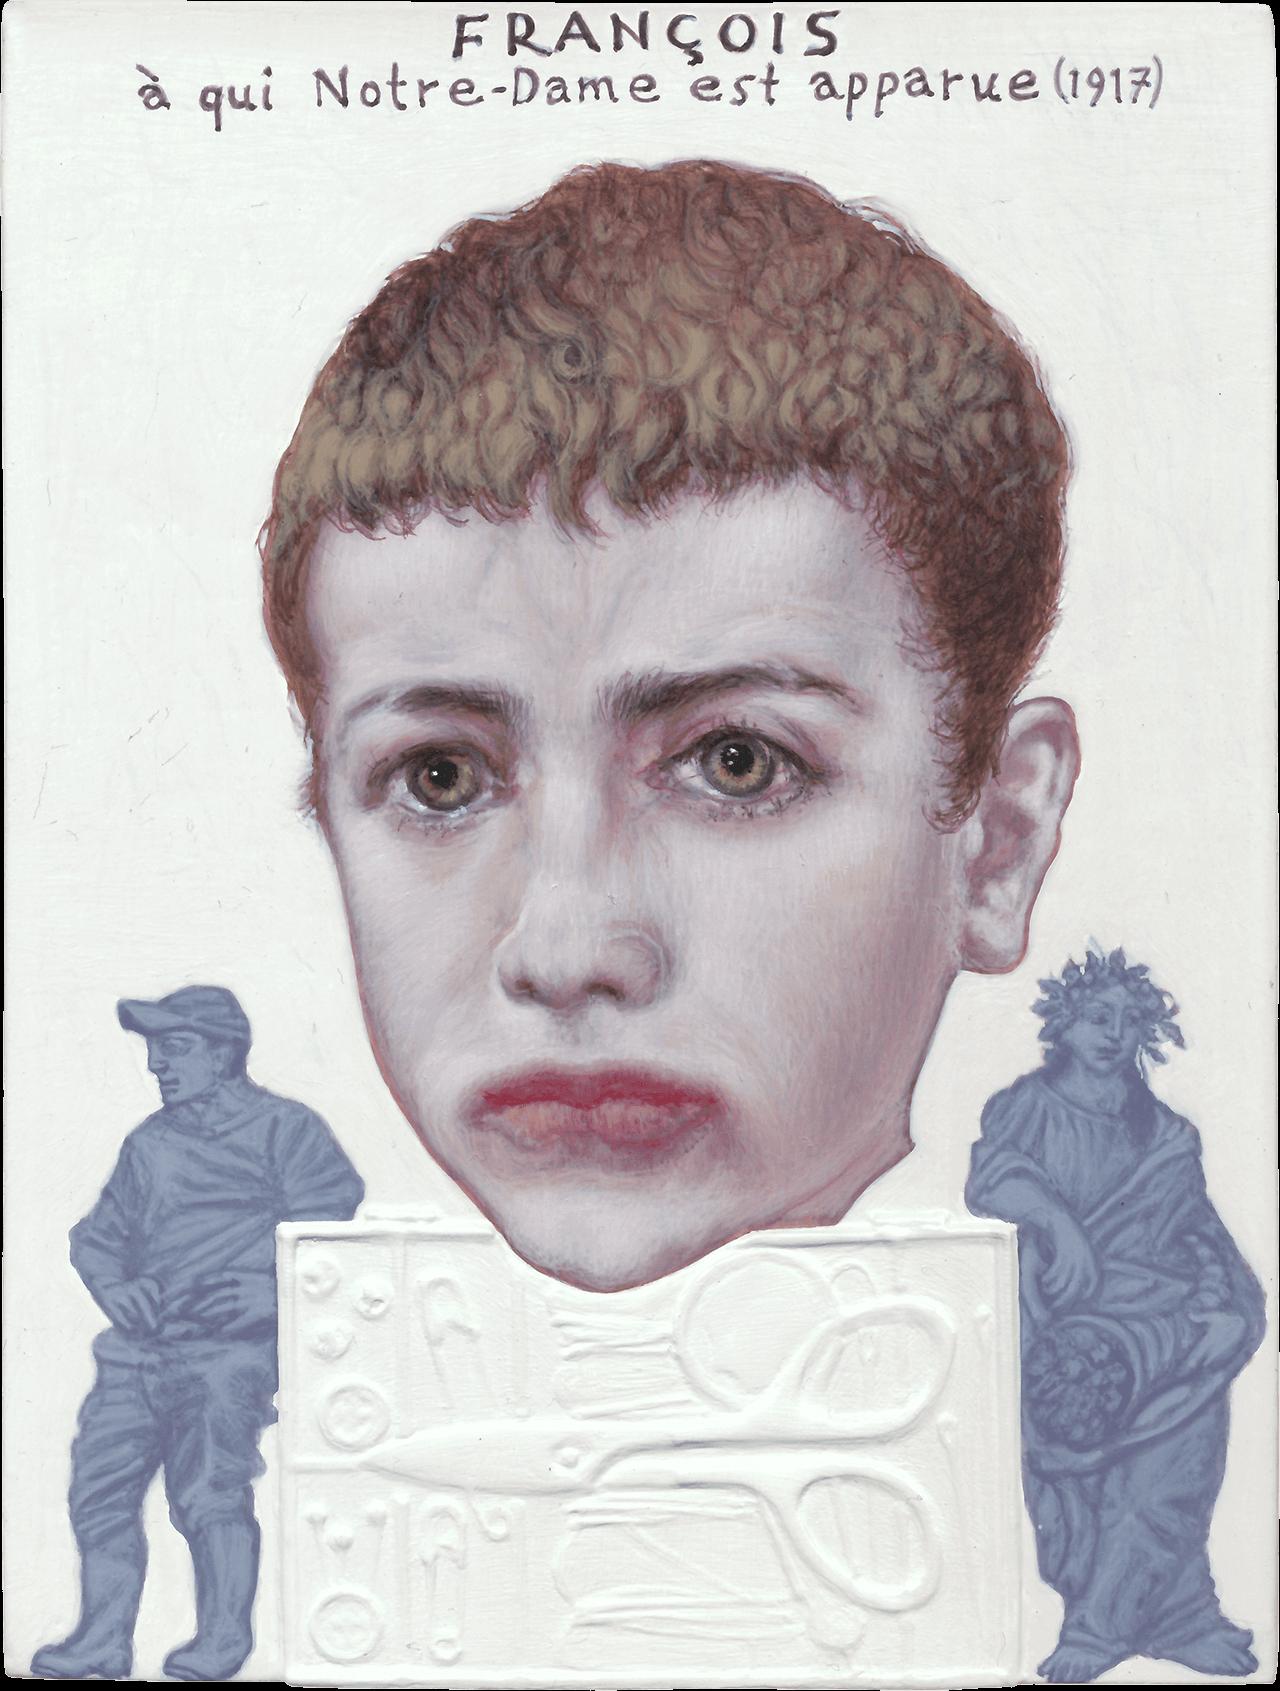 Francois, 2013, ακρυλικό σε χαρτόνι, 12,5x9,5 εκ.